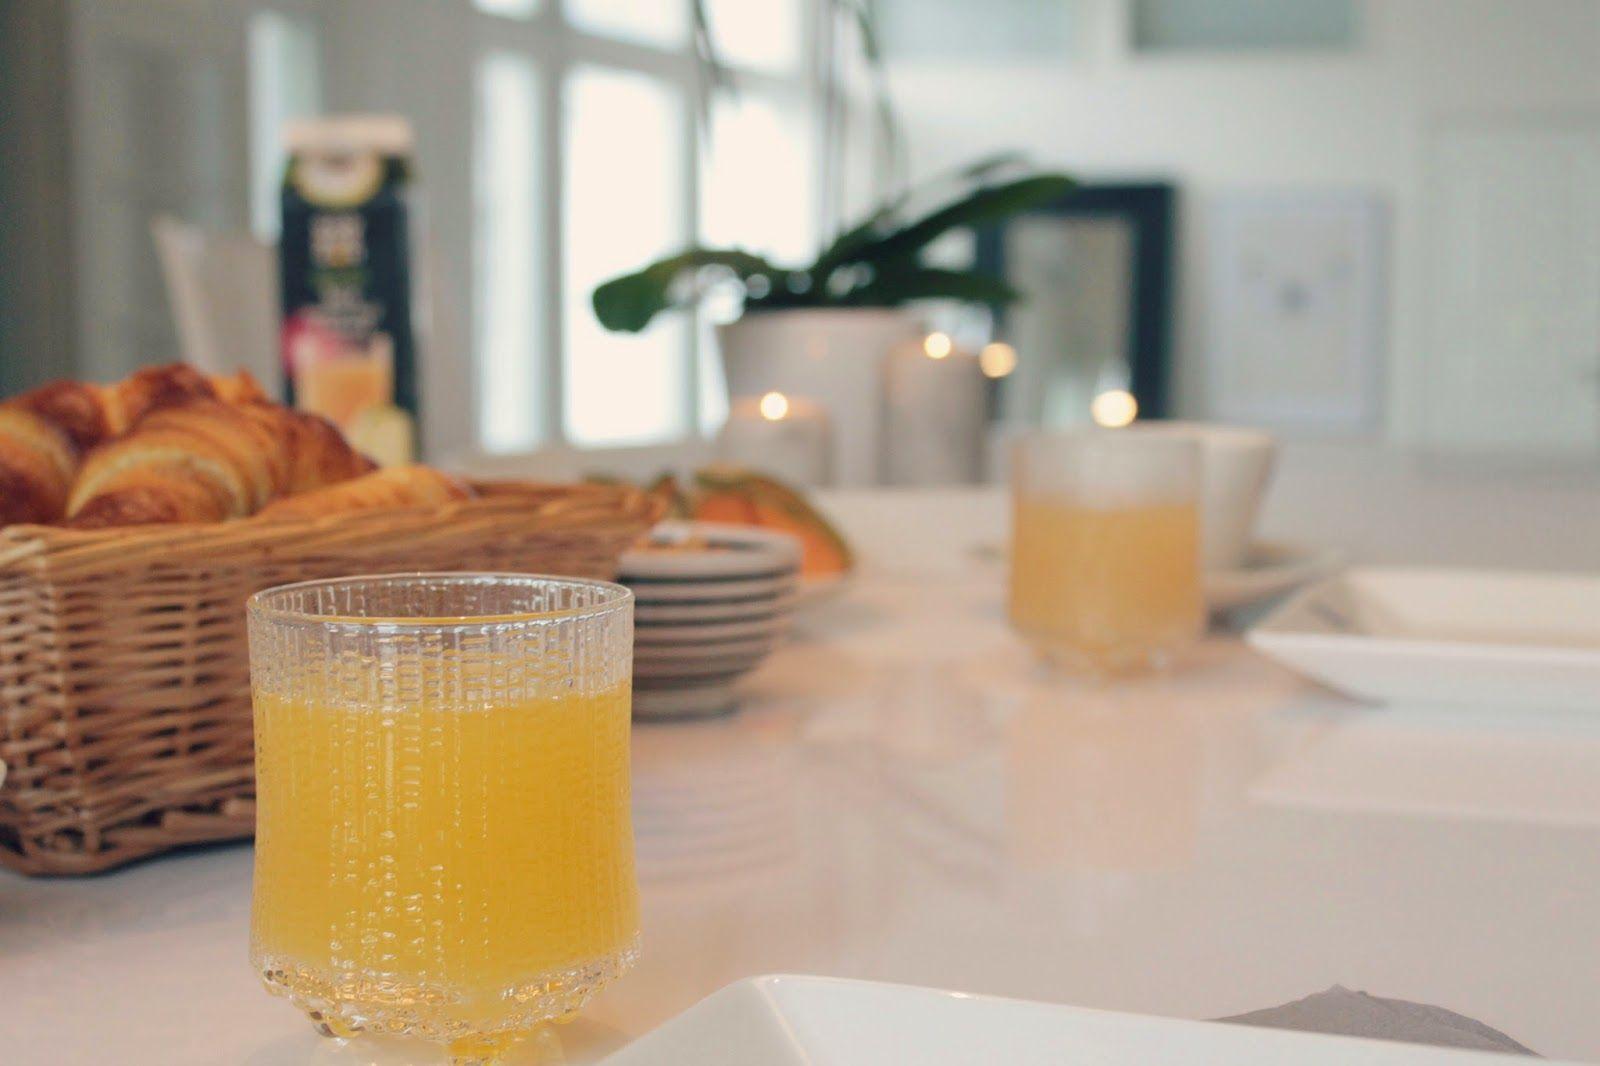 At Maria's: Easy like Sunday morning... ♫